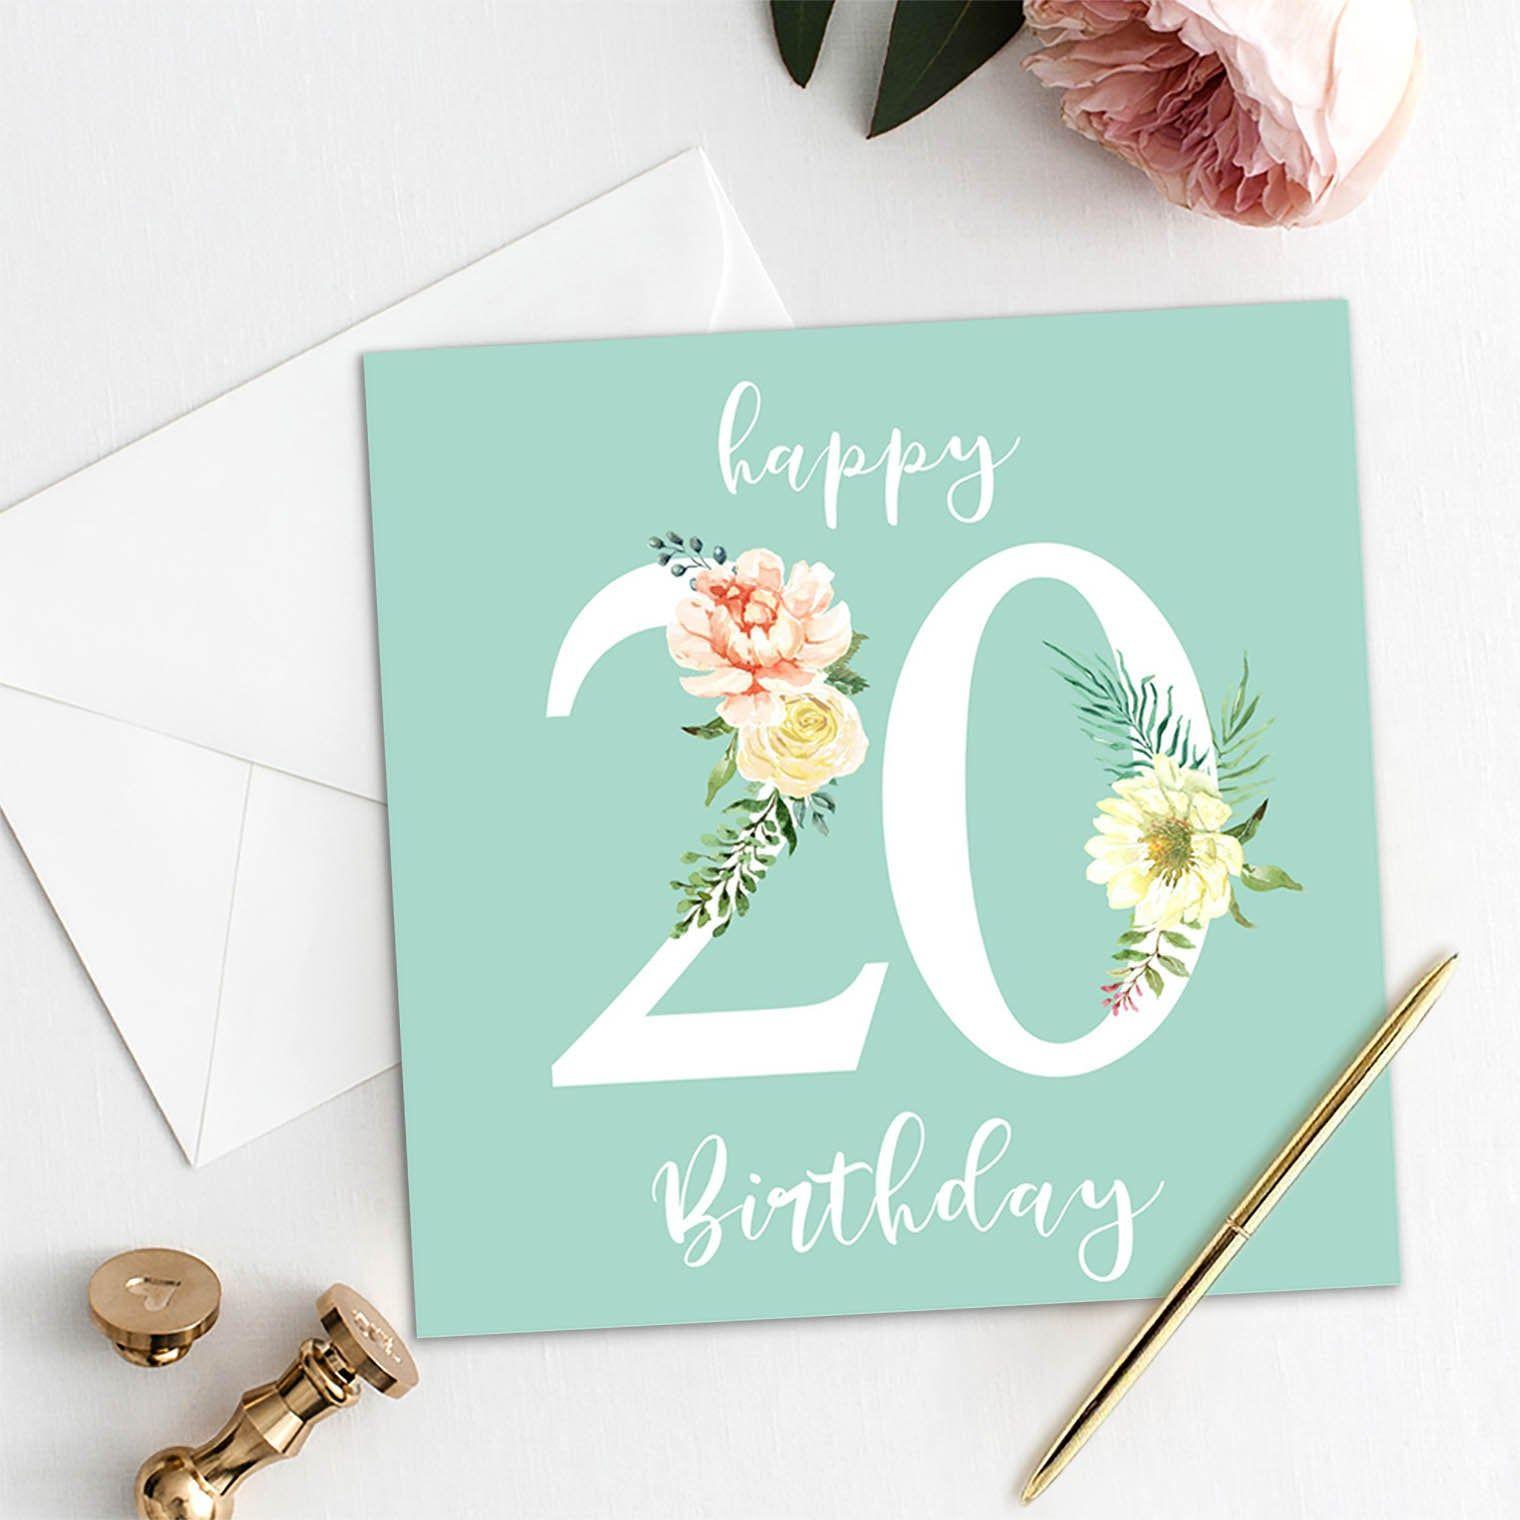 20 Birthday Card Age 20 Birthday Card 20 Birthday Present 20 Birthday Gift Ideas Birthday Party Diy Card For Her For Women Happy 20th Birthday Cards 20th Birthday Flower Birthday Cards